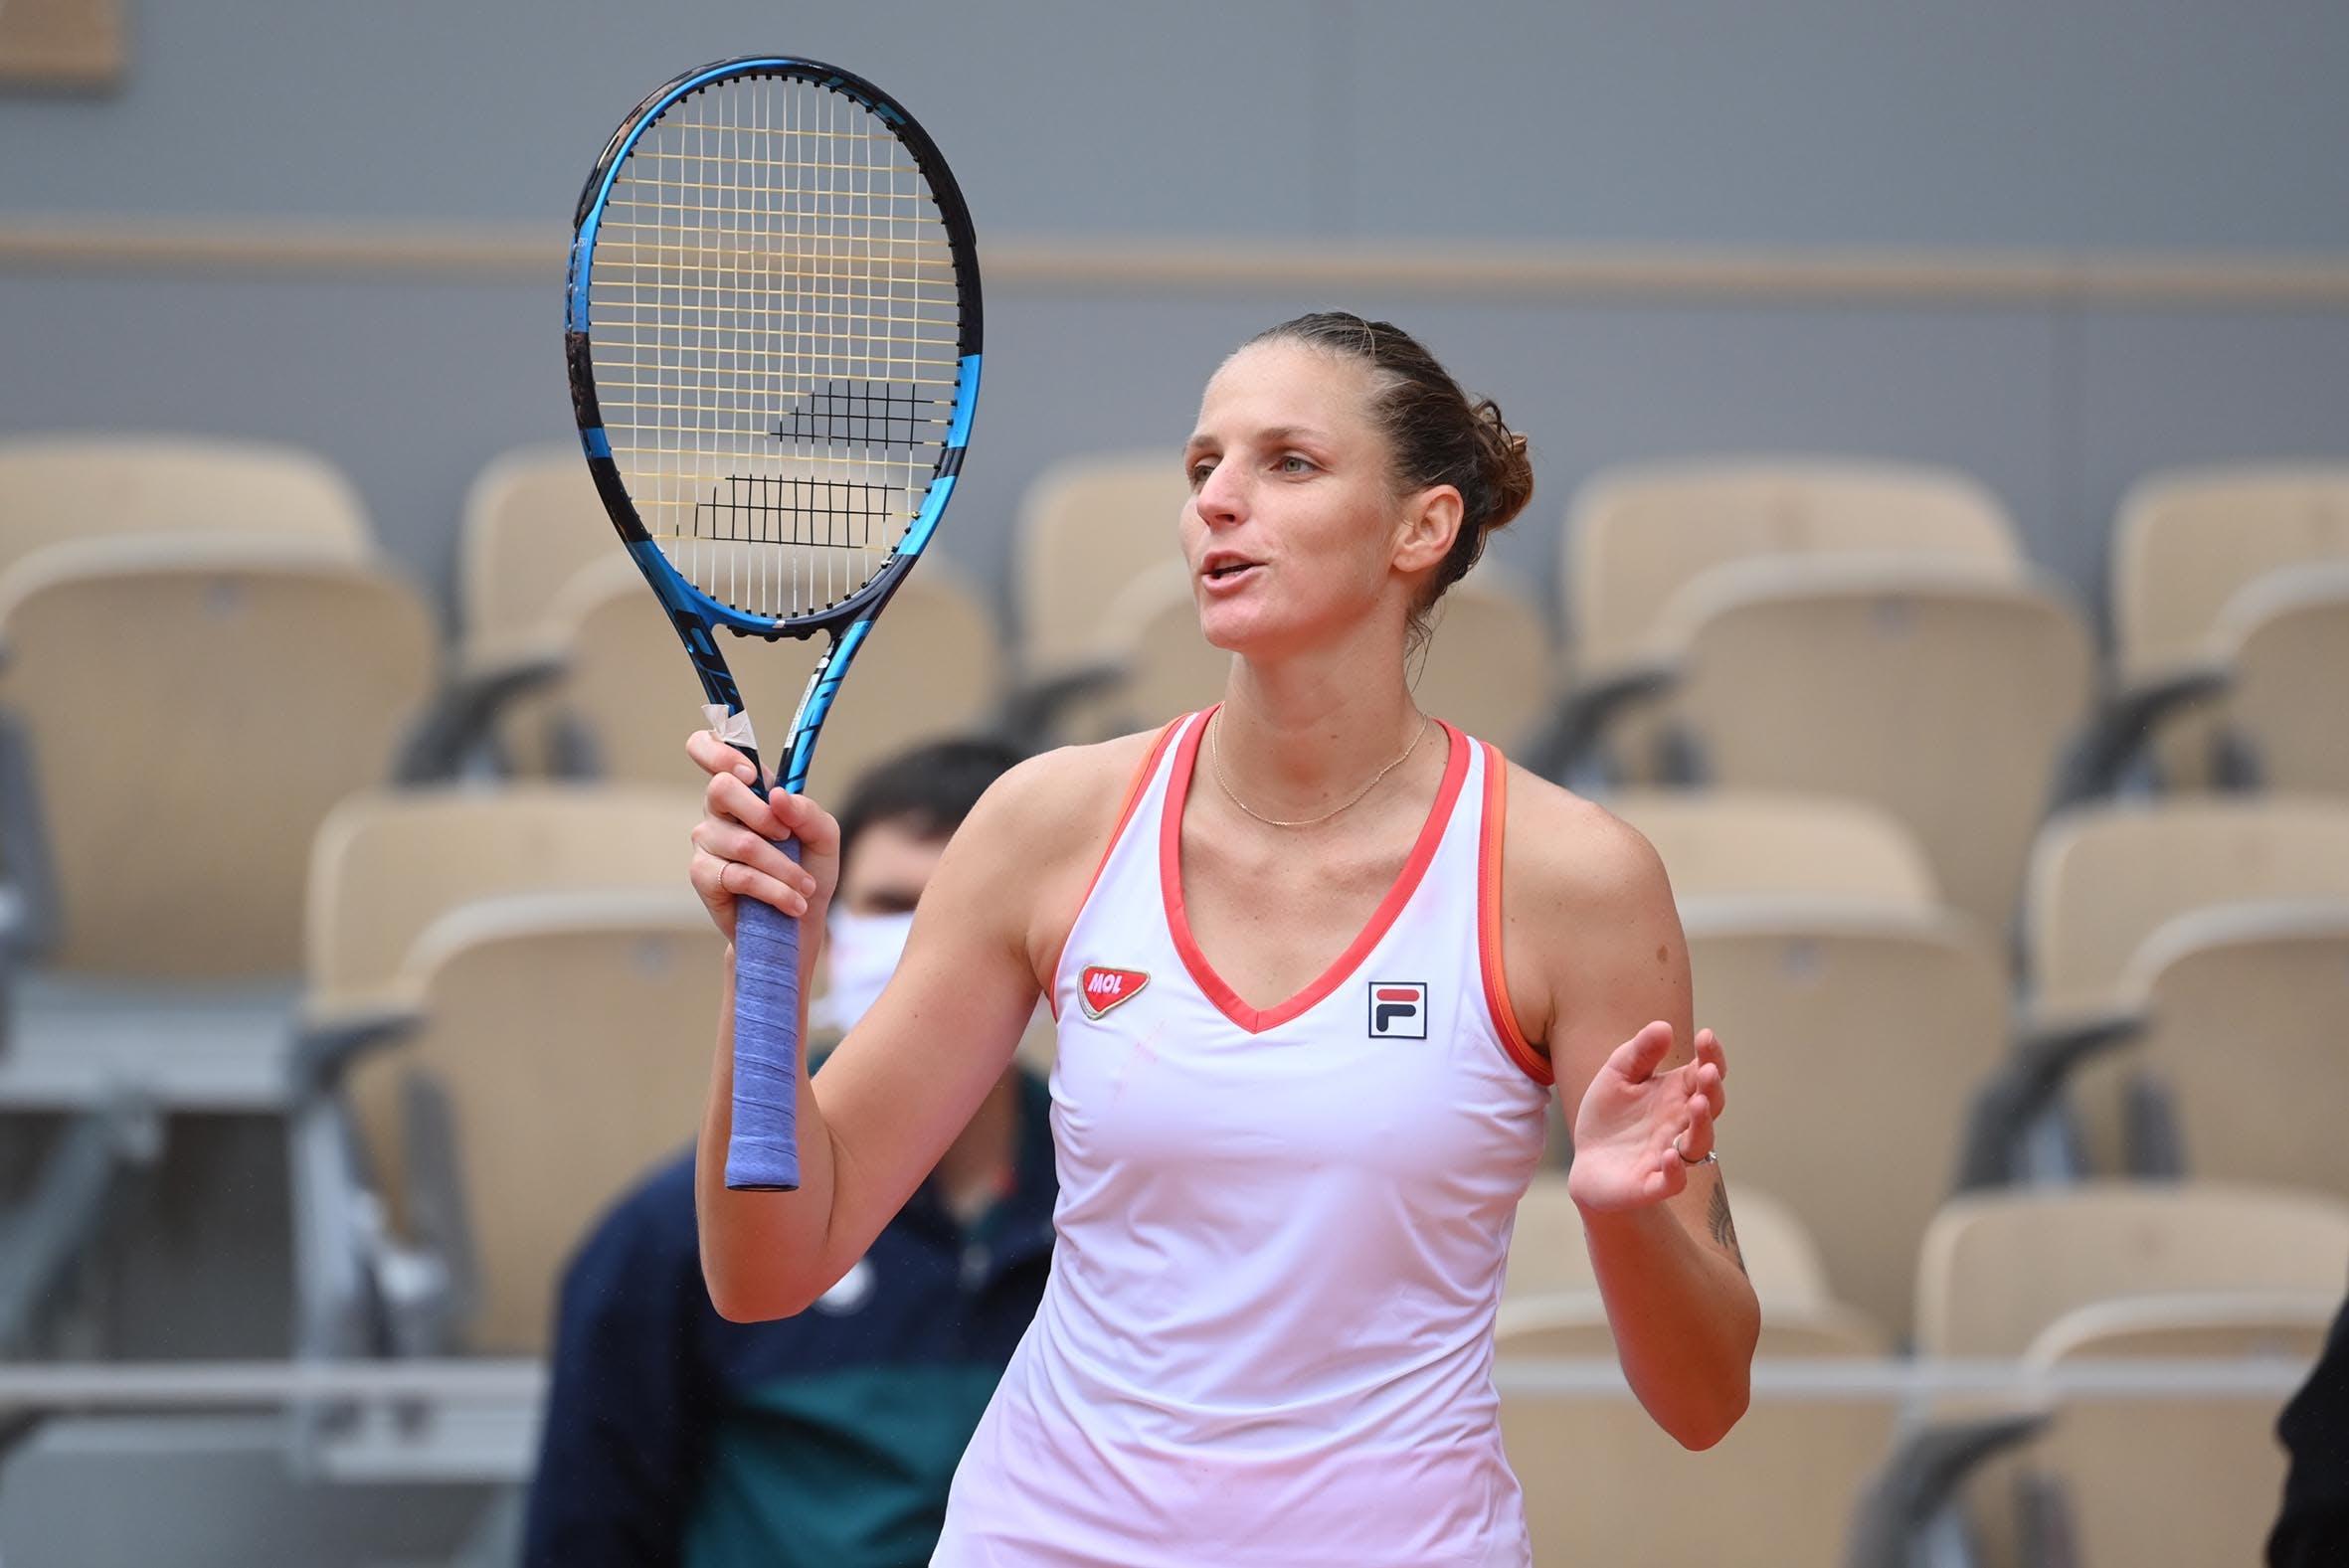 Karolina Pliskova Roland-Garros 2020